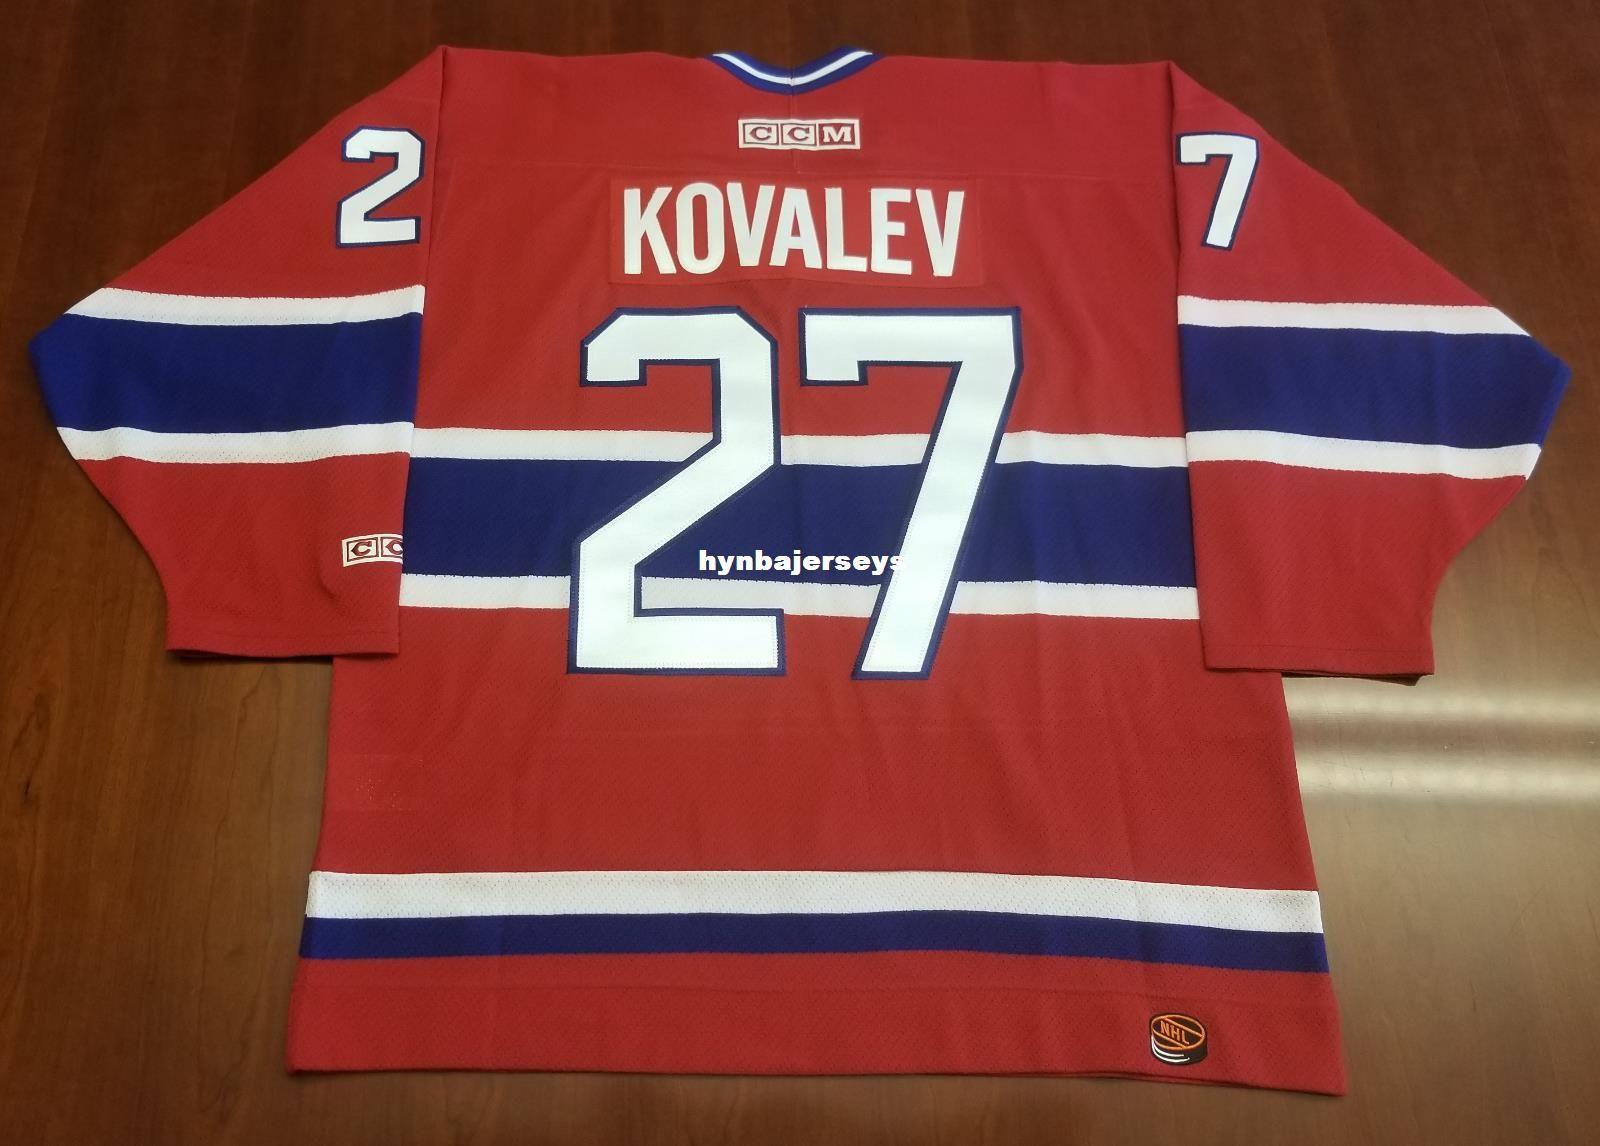 c1ac5b0f3 Custom Alex Kovalev Vintage Montreal Canadiens CCM Cheap Hockey Jersey Red  Habs Mens Retro Jerseys Canada 2019 From Hynbajerseys